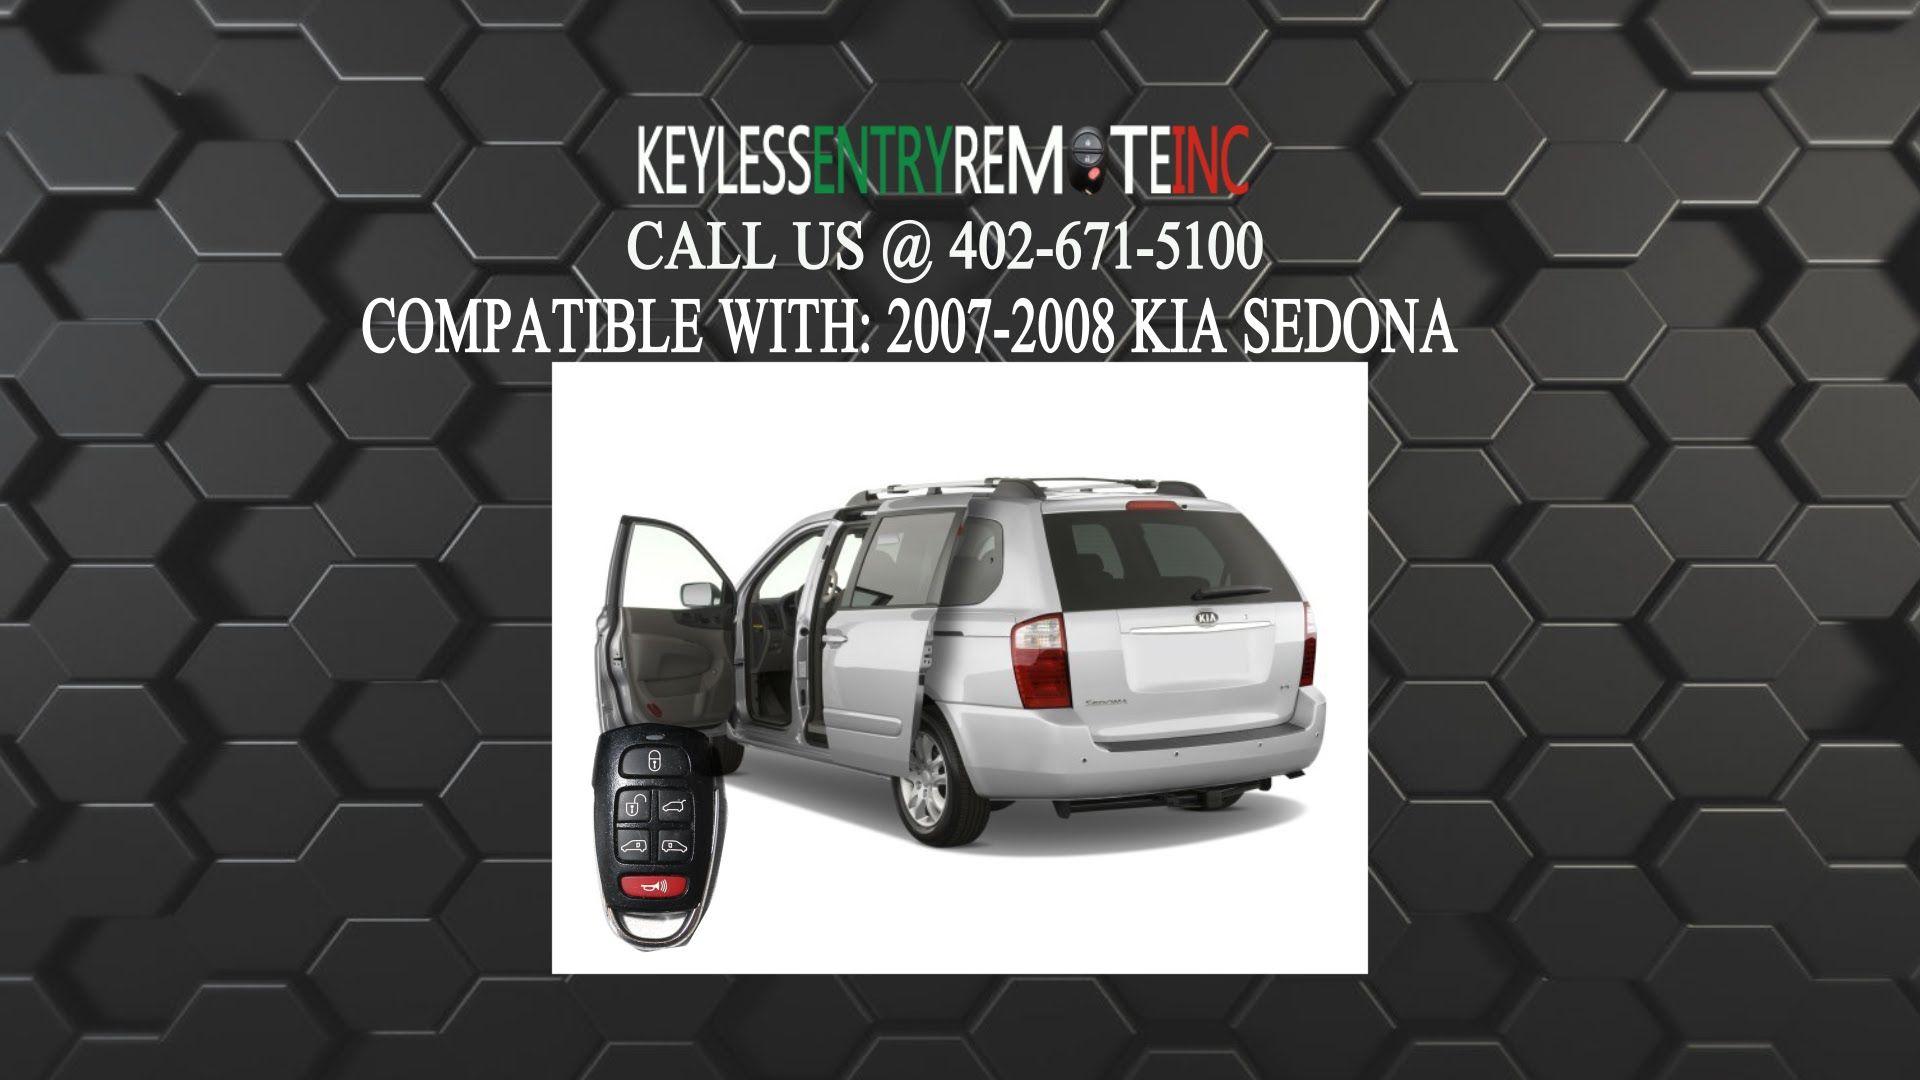 How To Replace KIA Sedona Key Fob Battery 2006 - 2014 | How